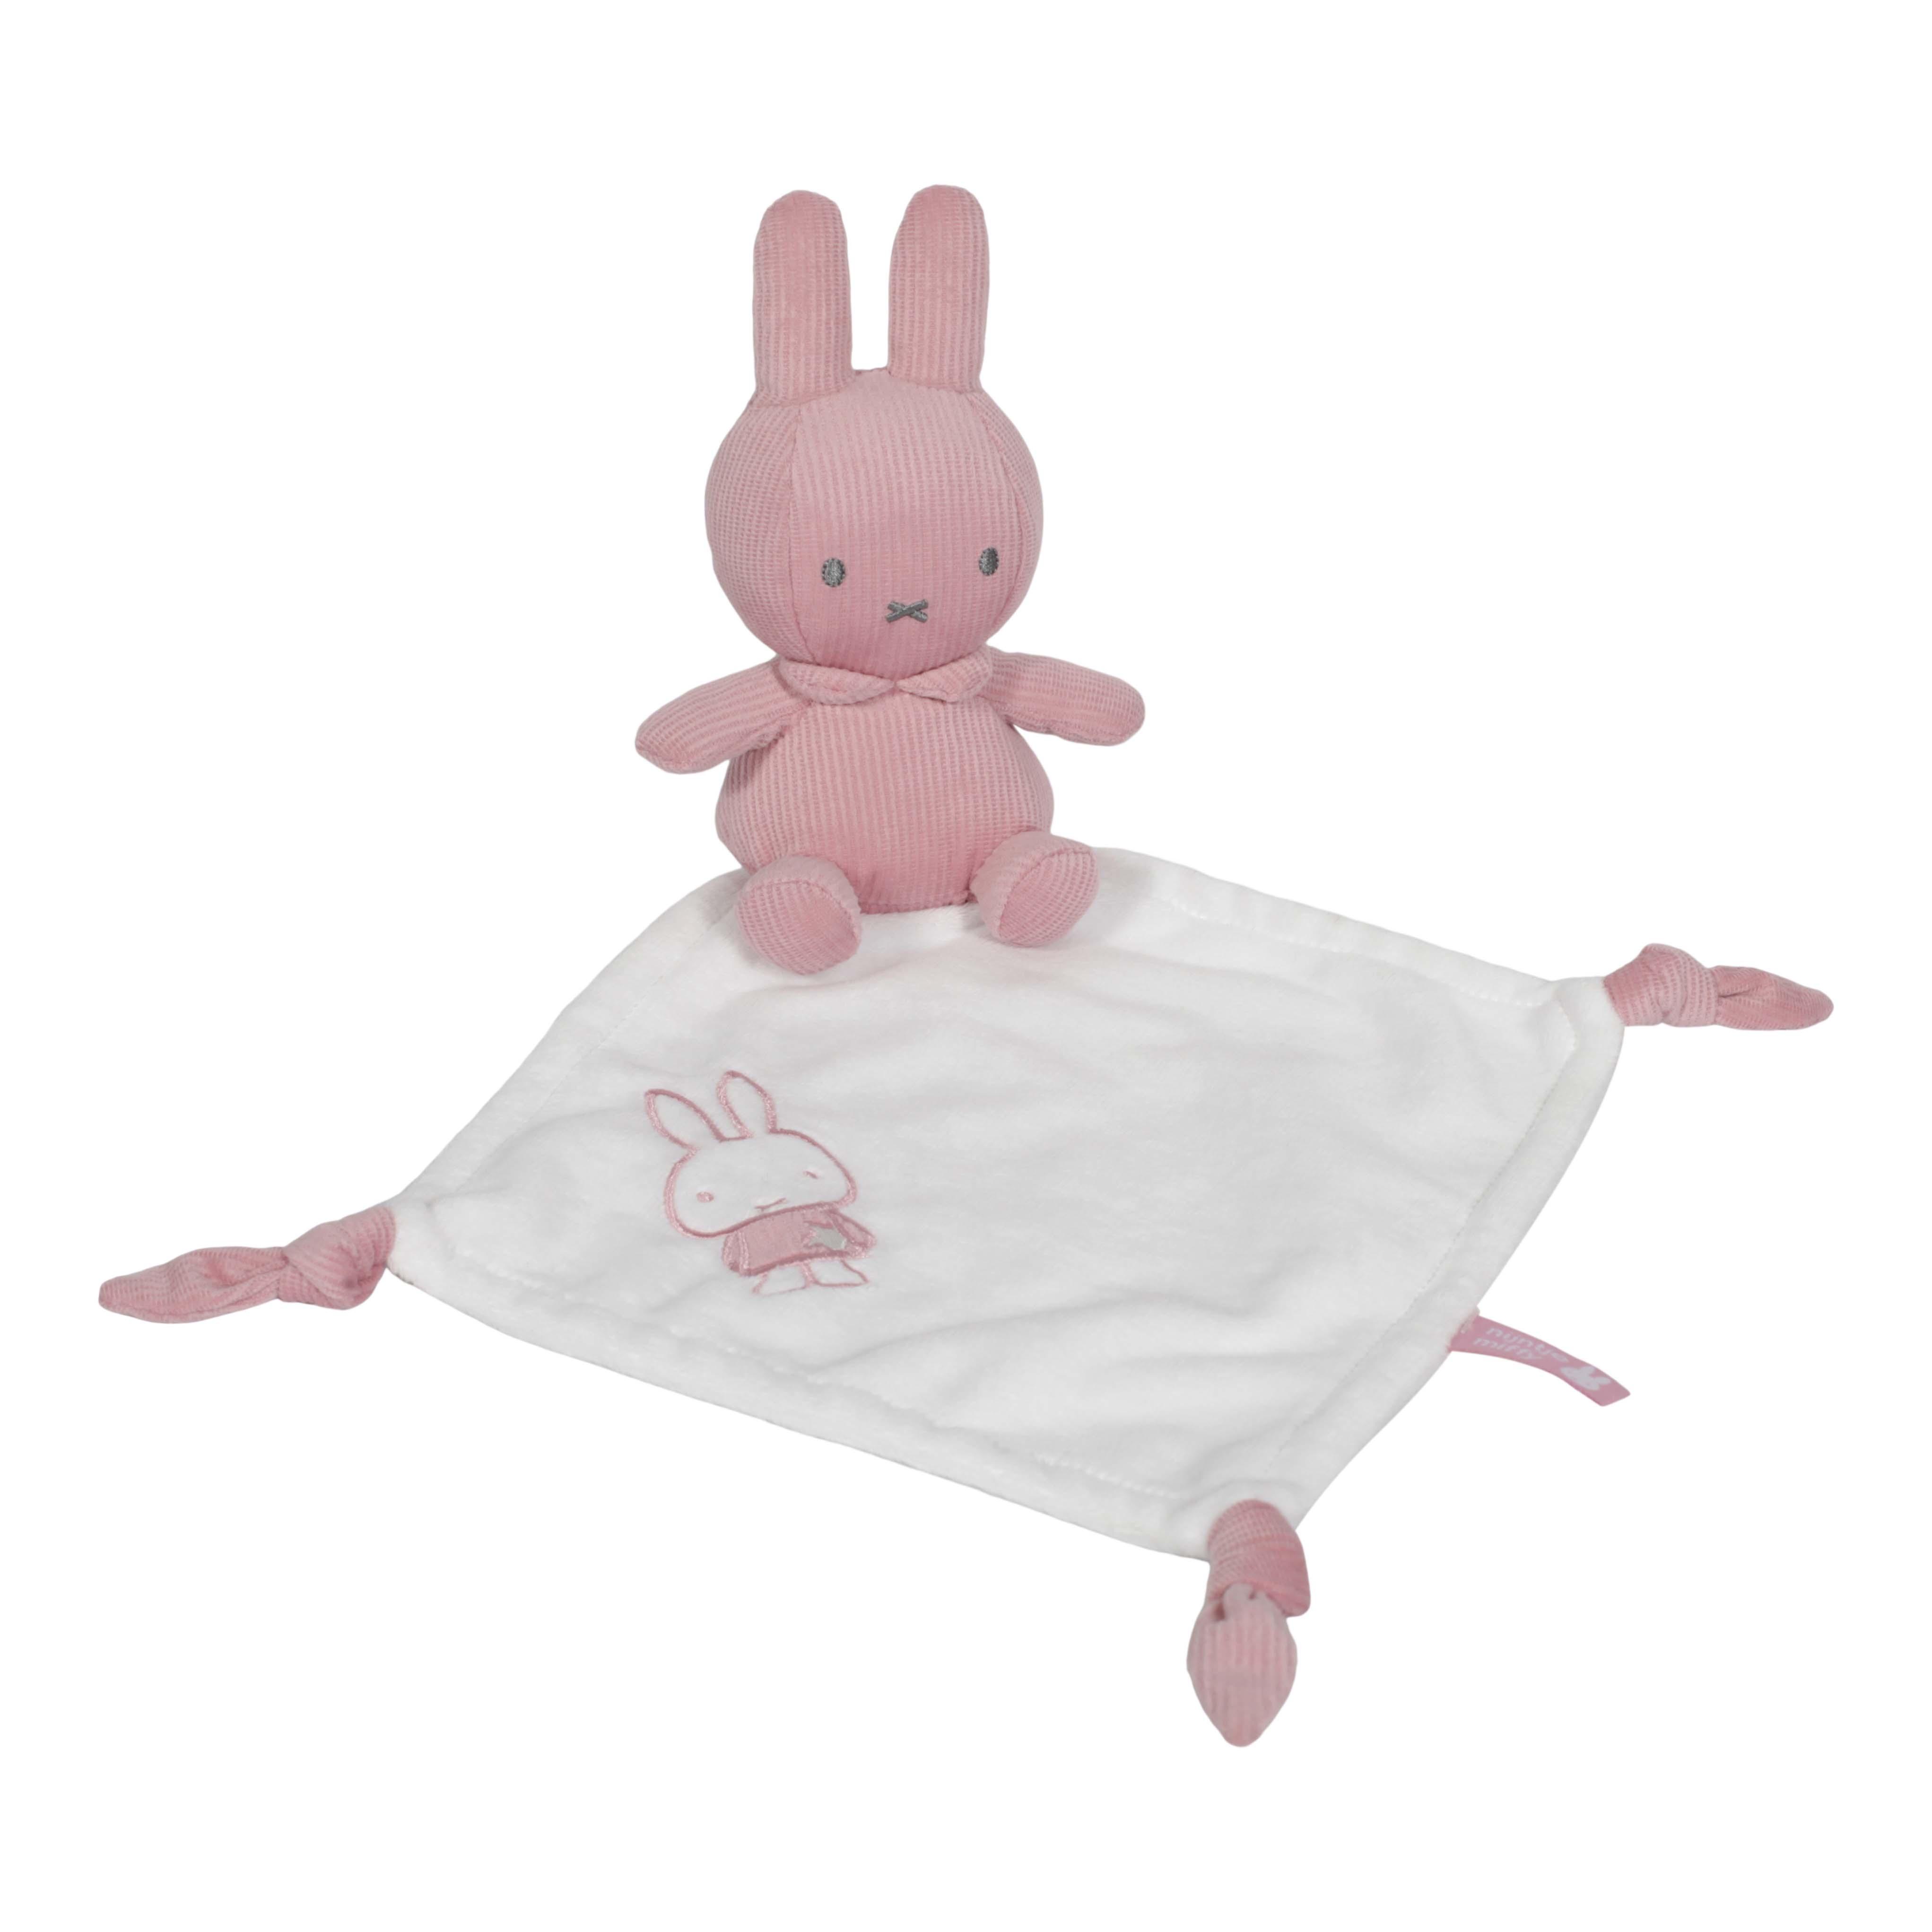 Afbeelding van Nijntje Knuffeldoekje Roze Babyrib